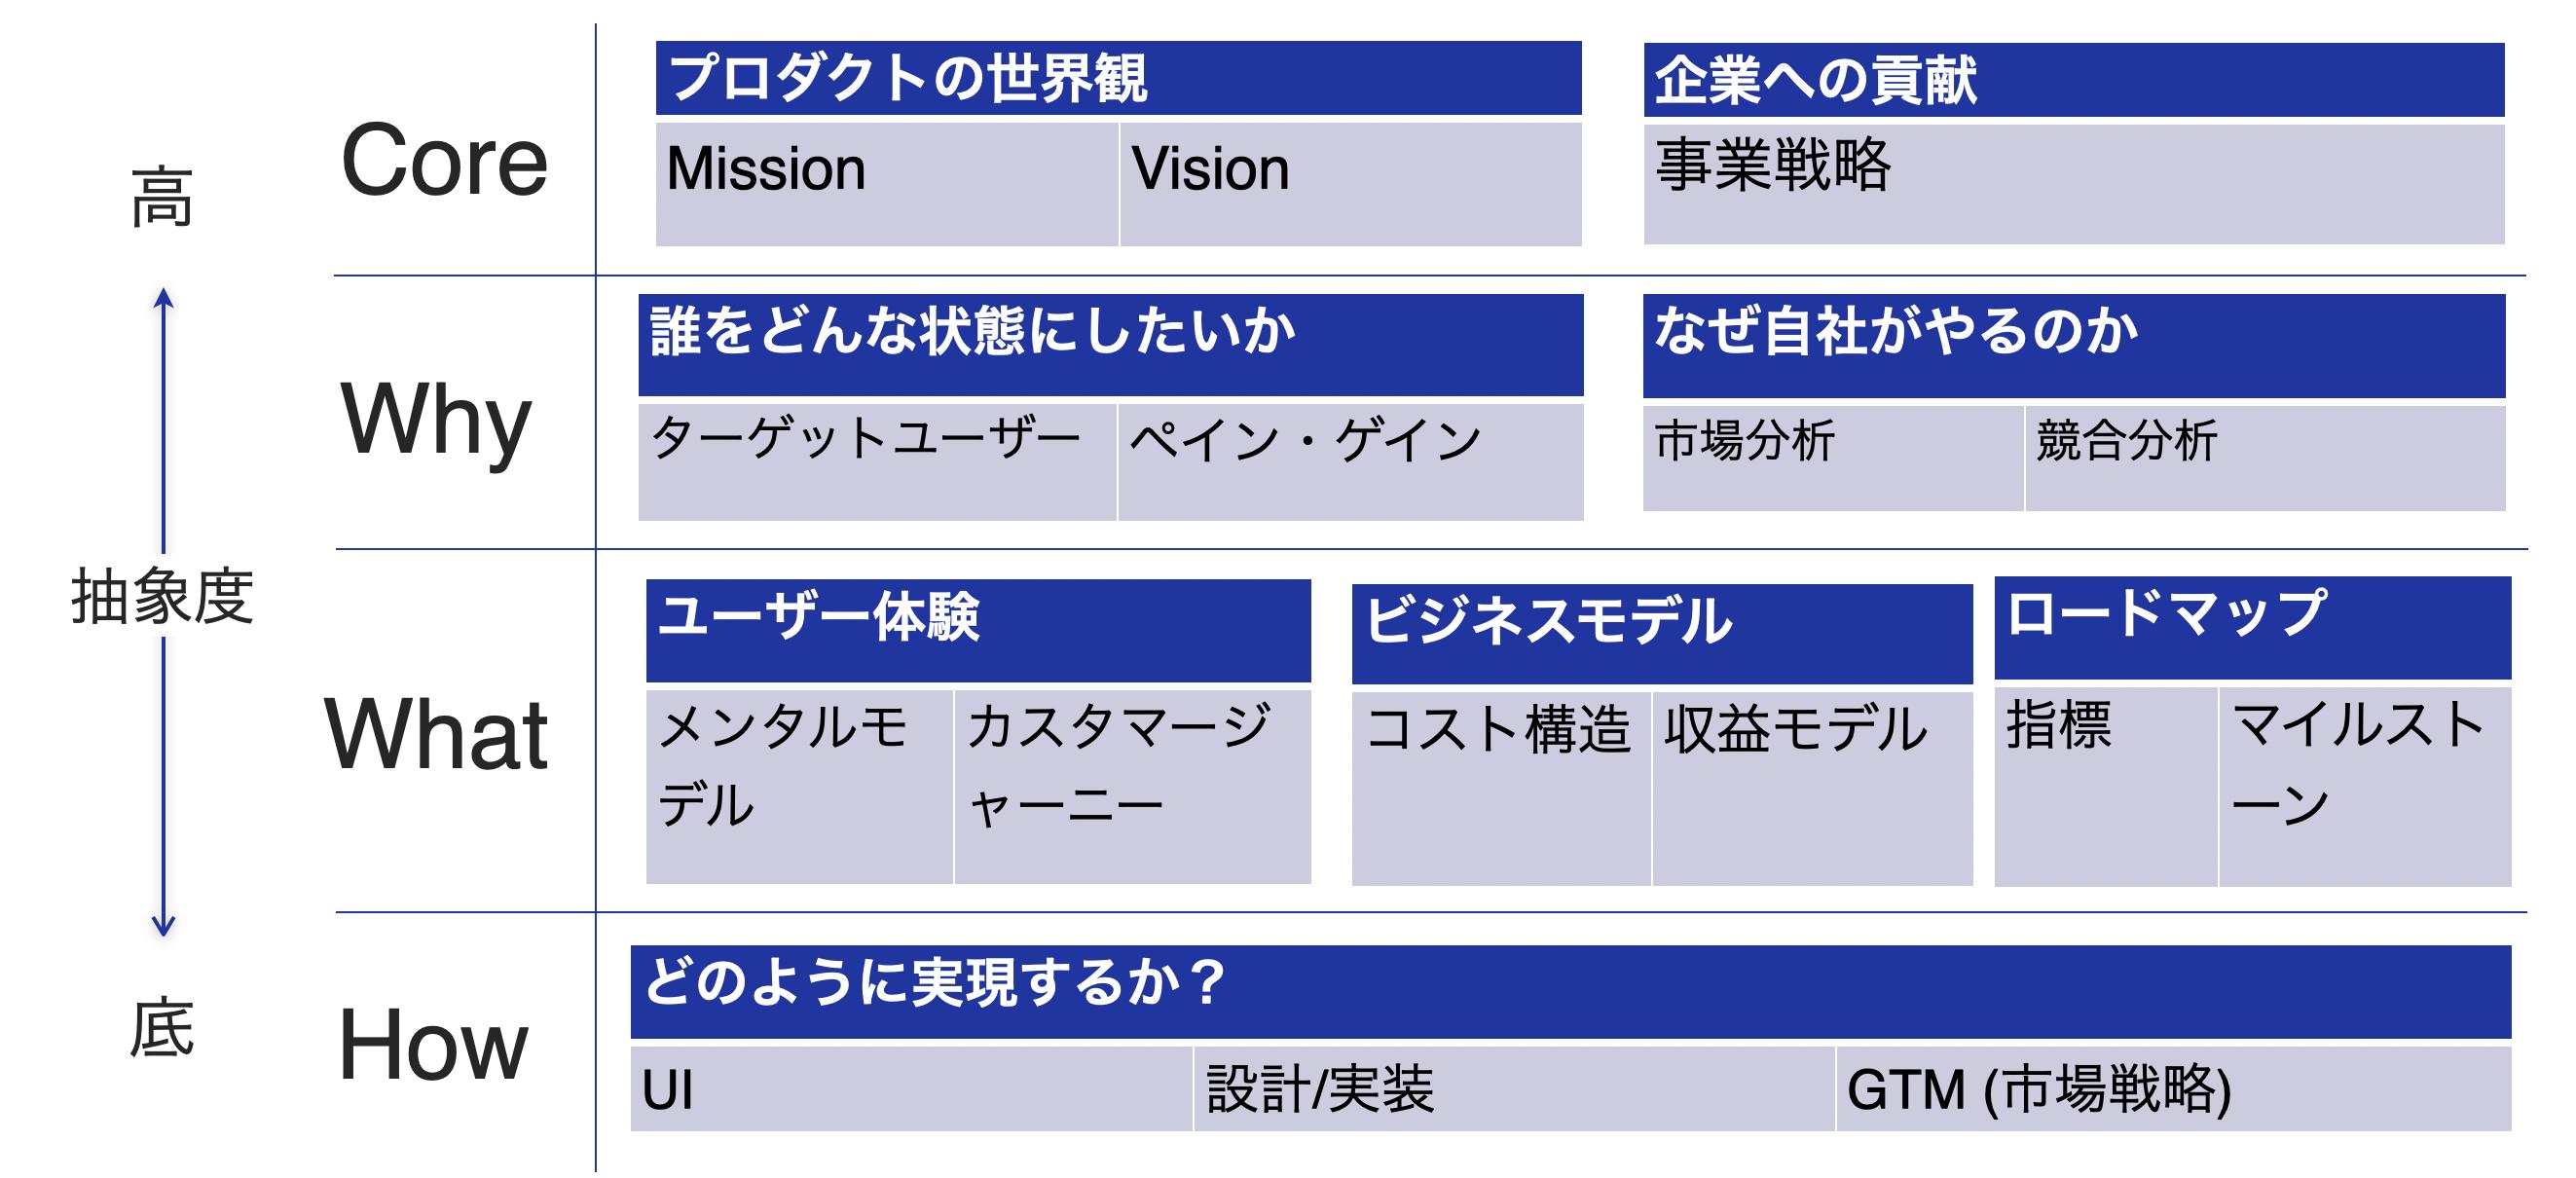 [PdM/PO] プロダクトの構想フェイズについて(4層の仮説立案→リーンキャンバス→インセプションデッキ→ストーリーマッピング→プロダクトバックログ化)